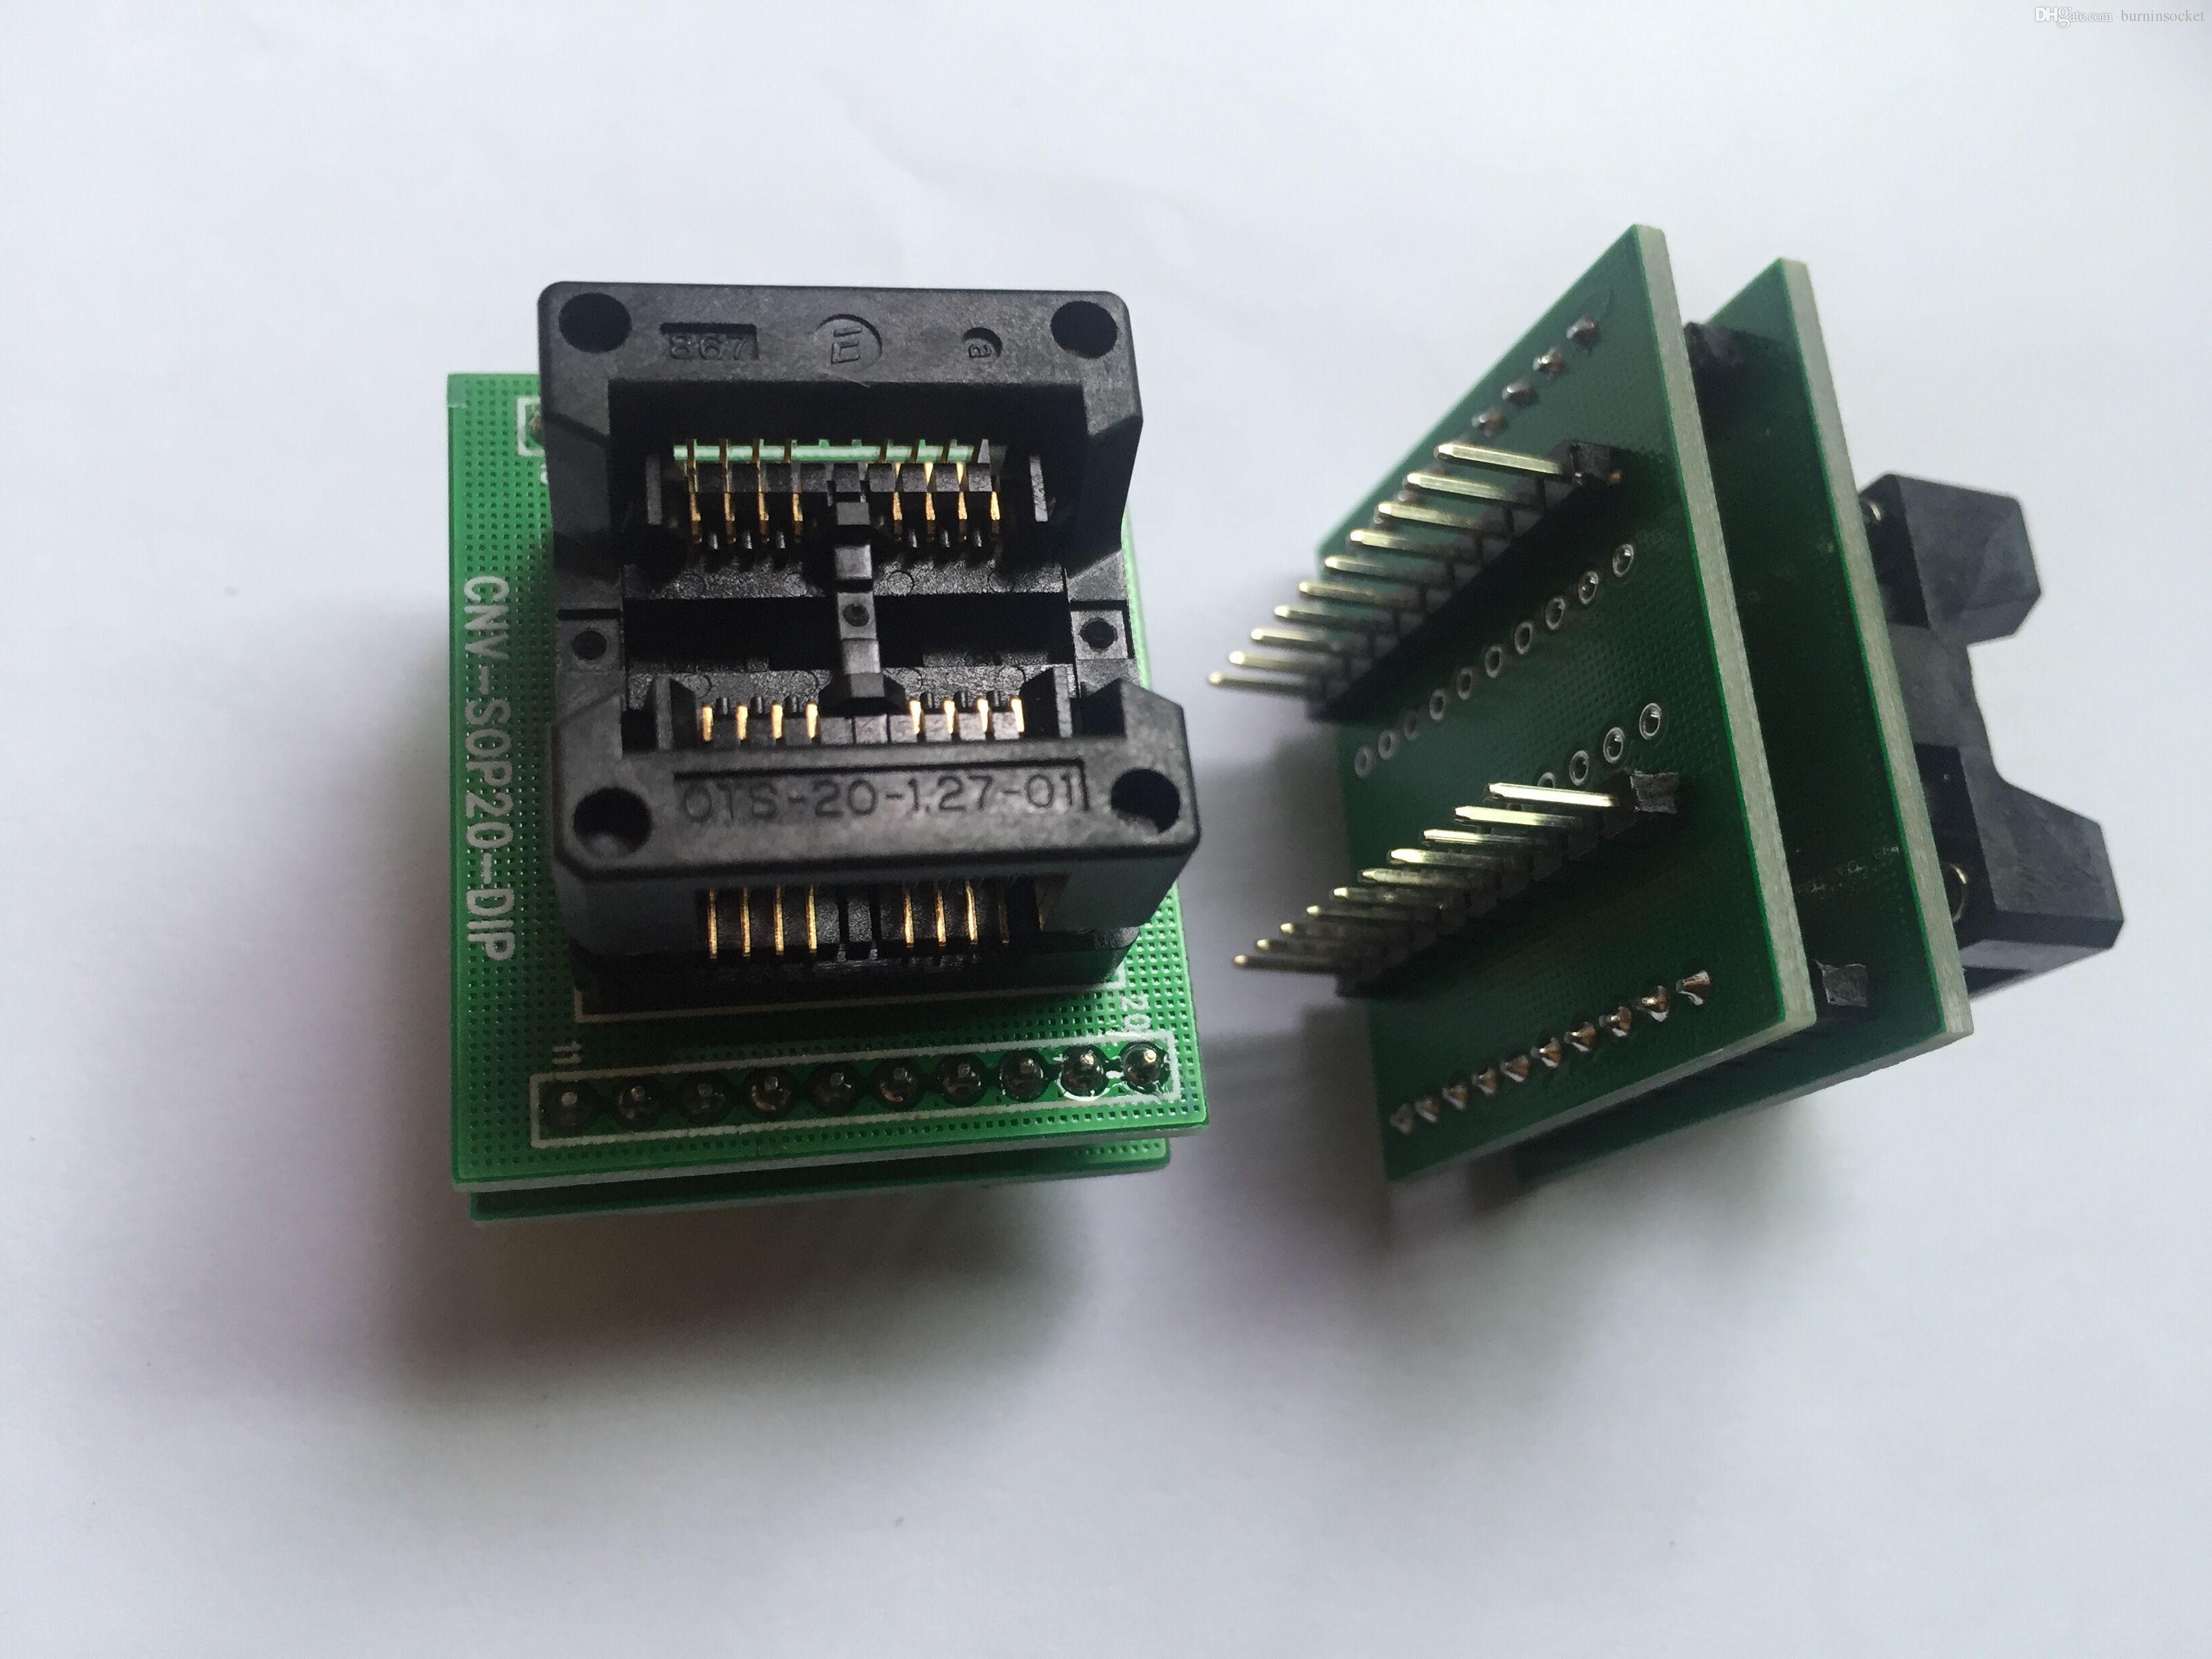 Enplas IC Test Soceket OTS-16(20M)-1.27-01 with Pcb Board SOP8 Programmer Adapter Burn in Socket